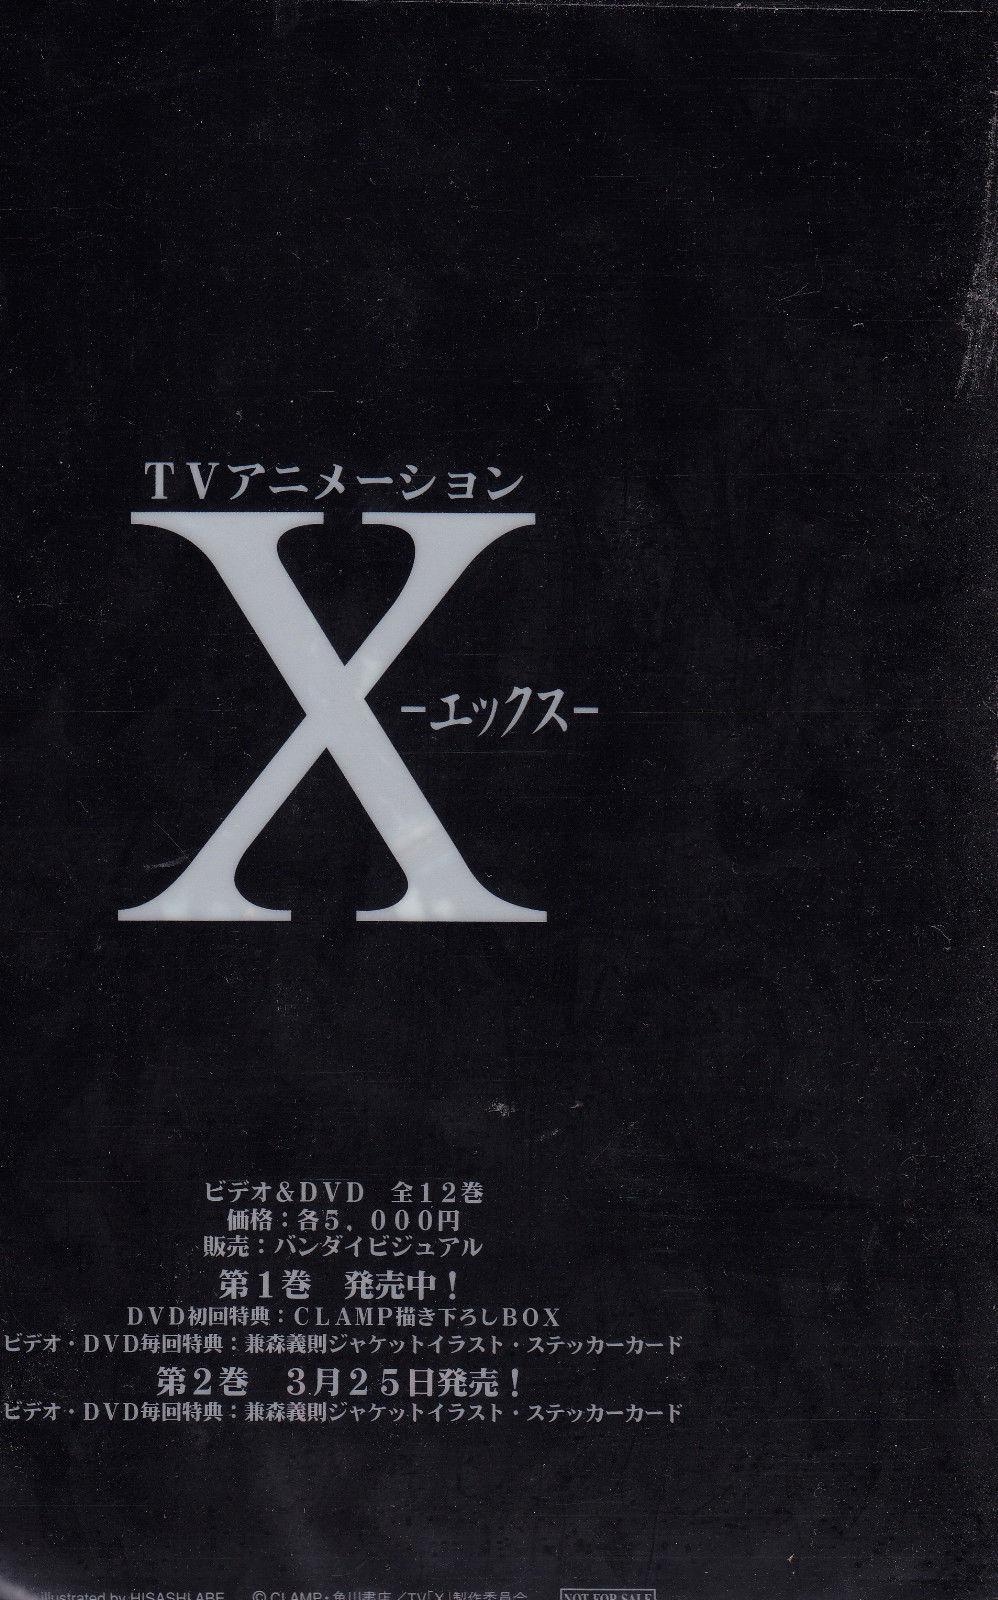 CLAMP X (TV) Clear File Folder Import JAPAN nfs Promo Item Kamui Shiro NEW USA